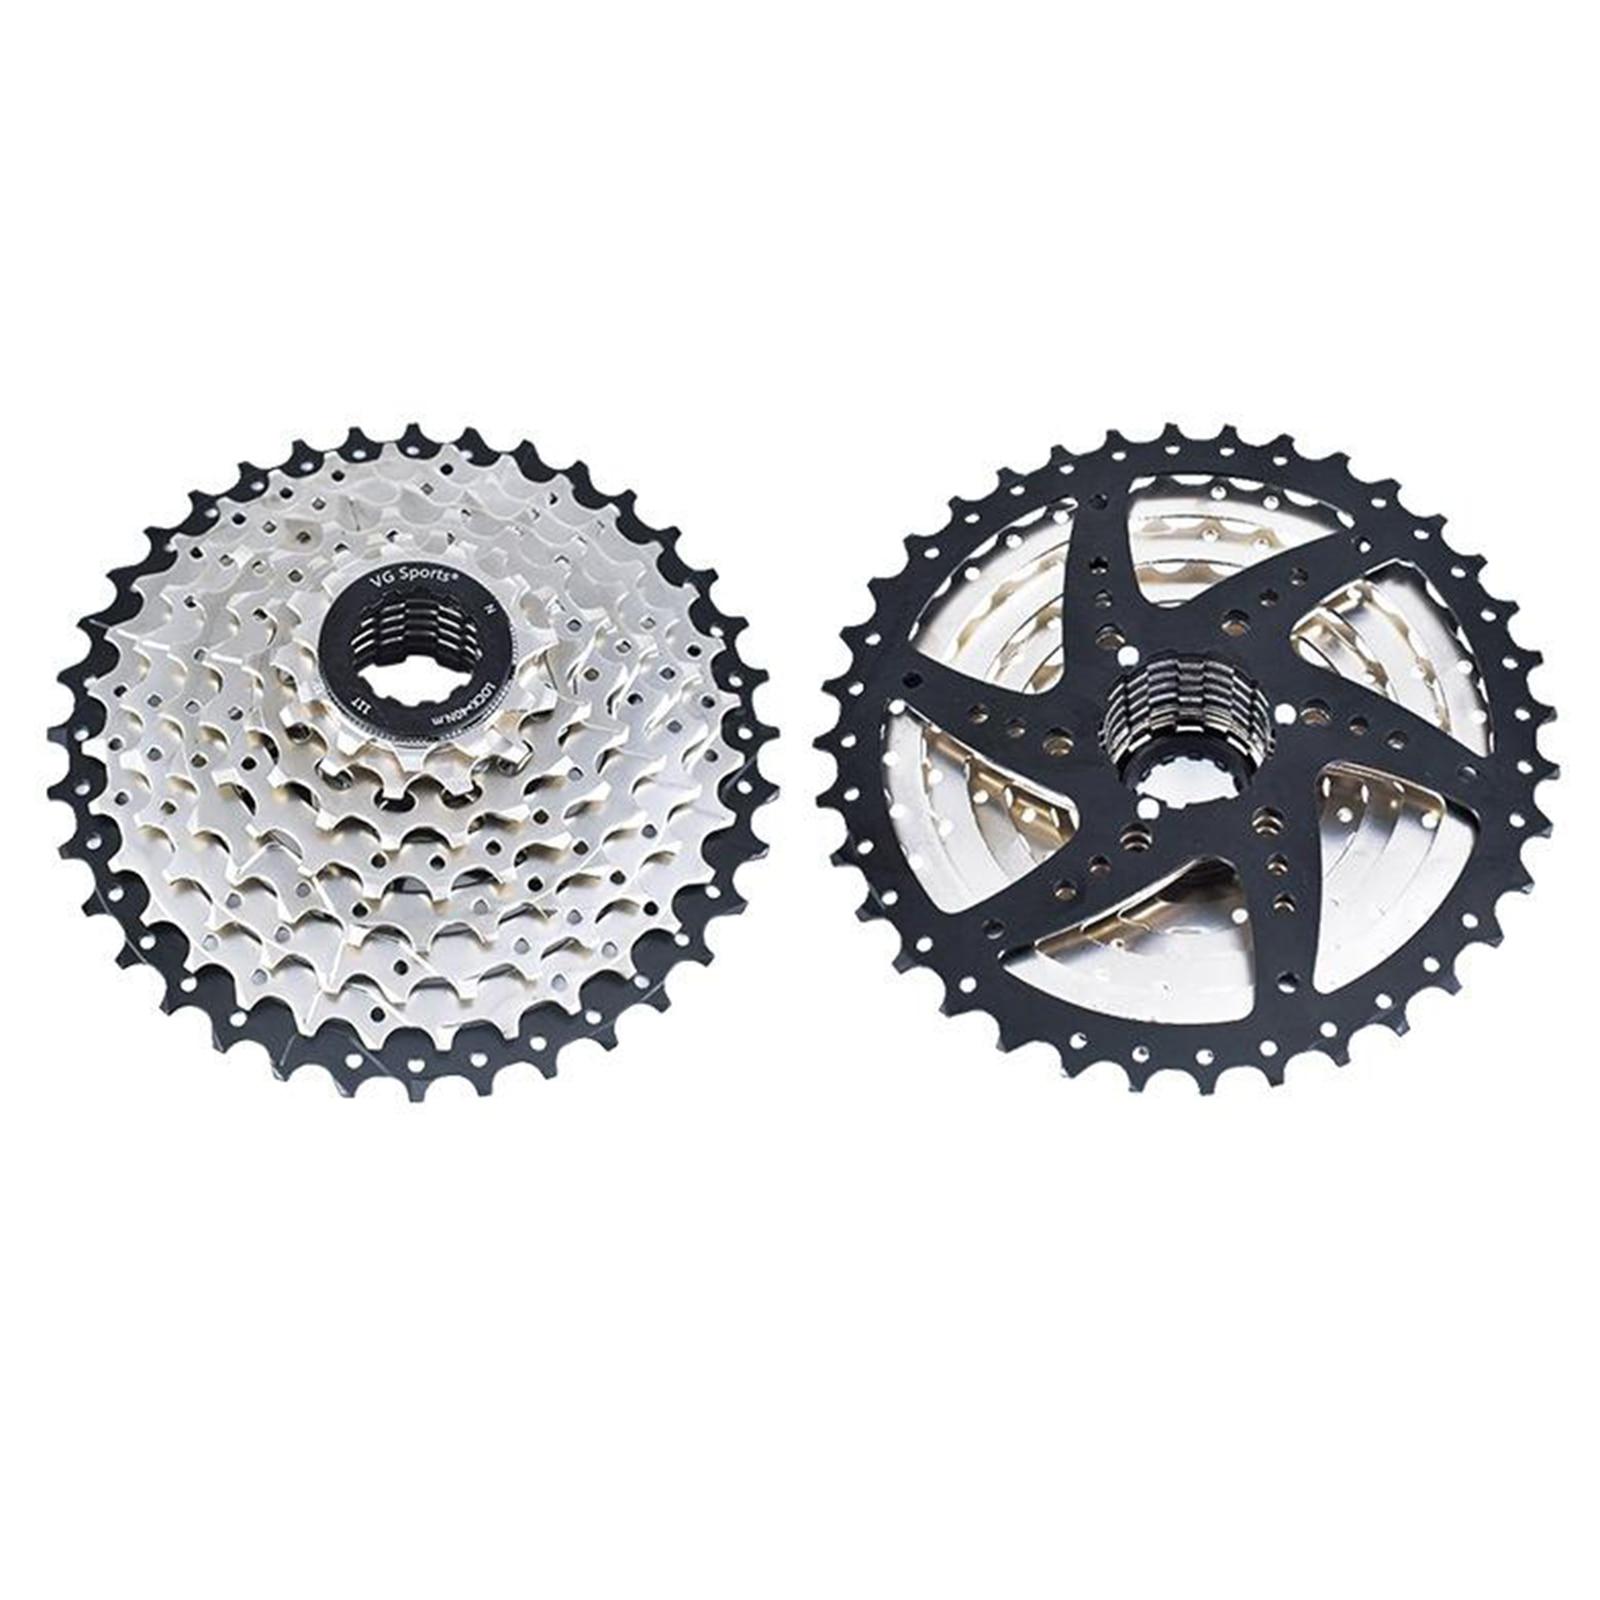 Road Bike Freewheel  8/9/10 Speed 11-32T Bicycle Cassette Sprocket Aluminum alloy Flywheel Mountain Bike Bicycle Part